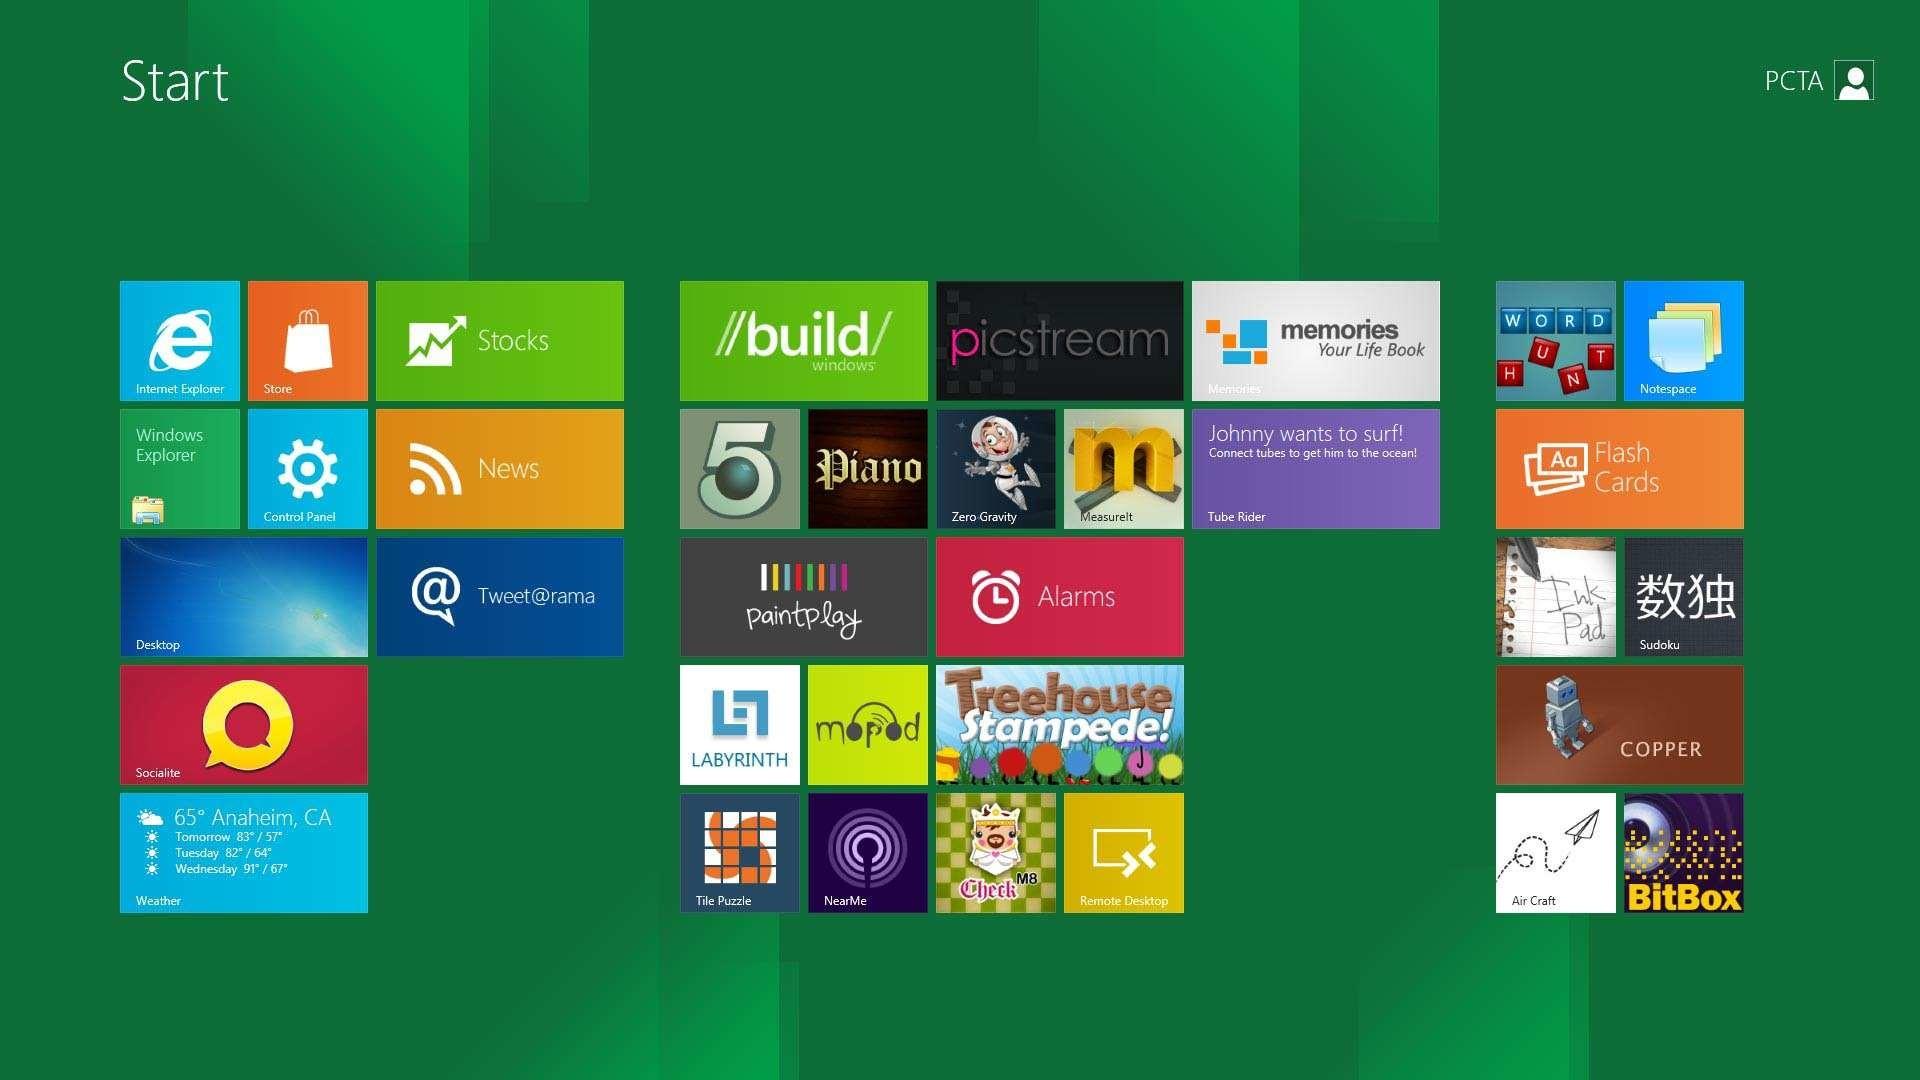 Windows 8 Green Tiles (31 Wallpapers)